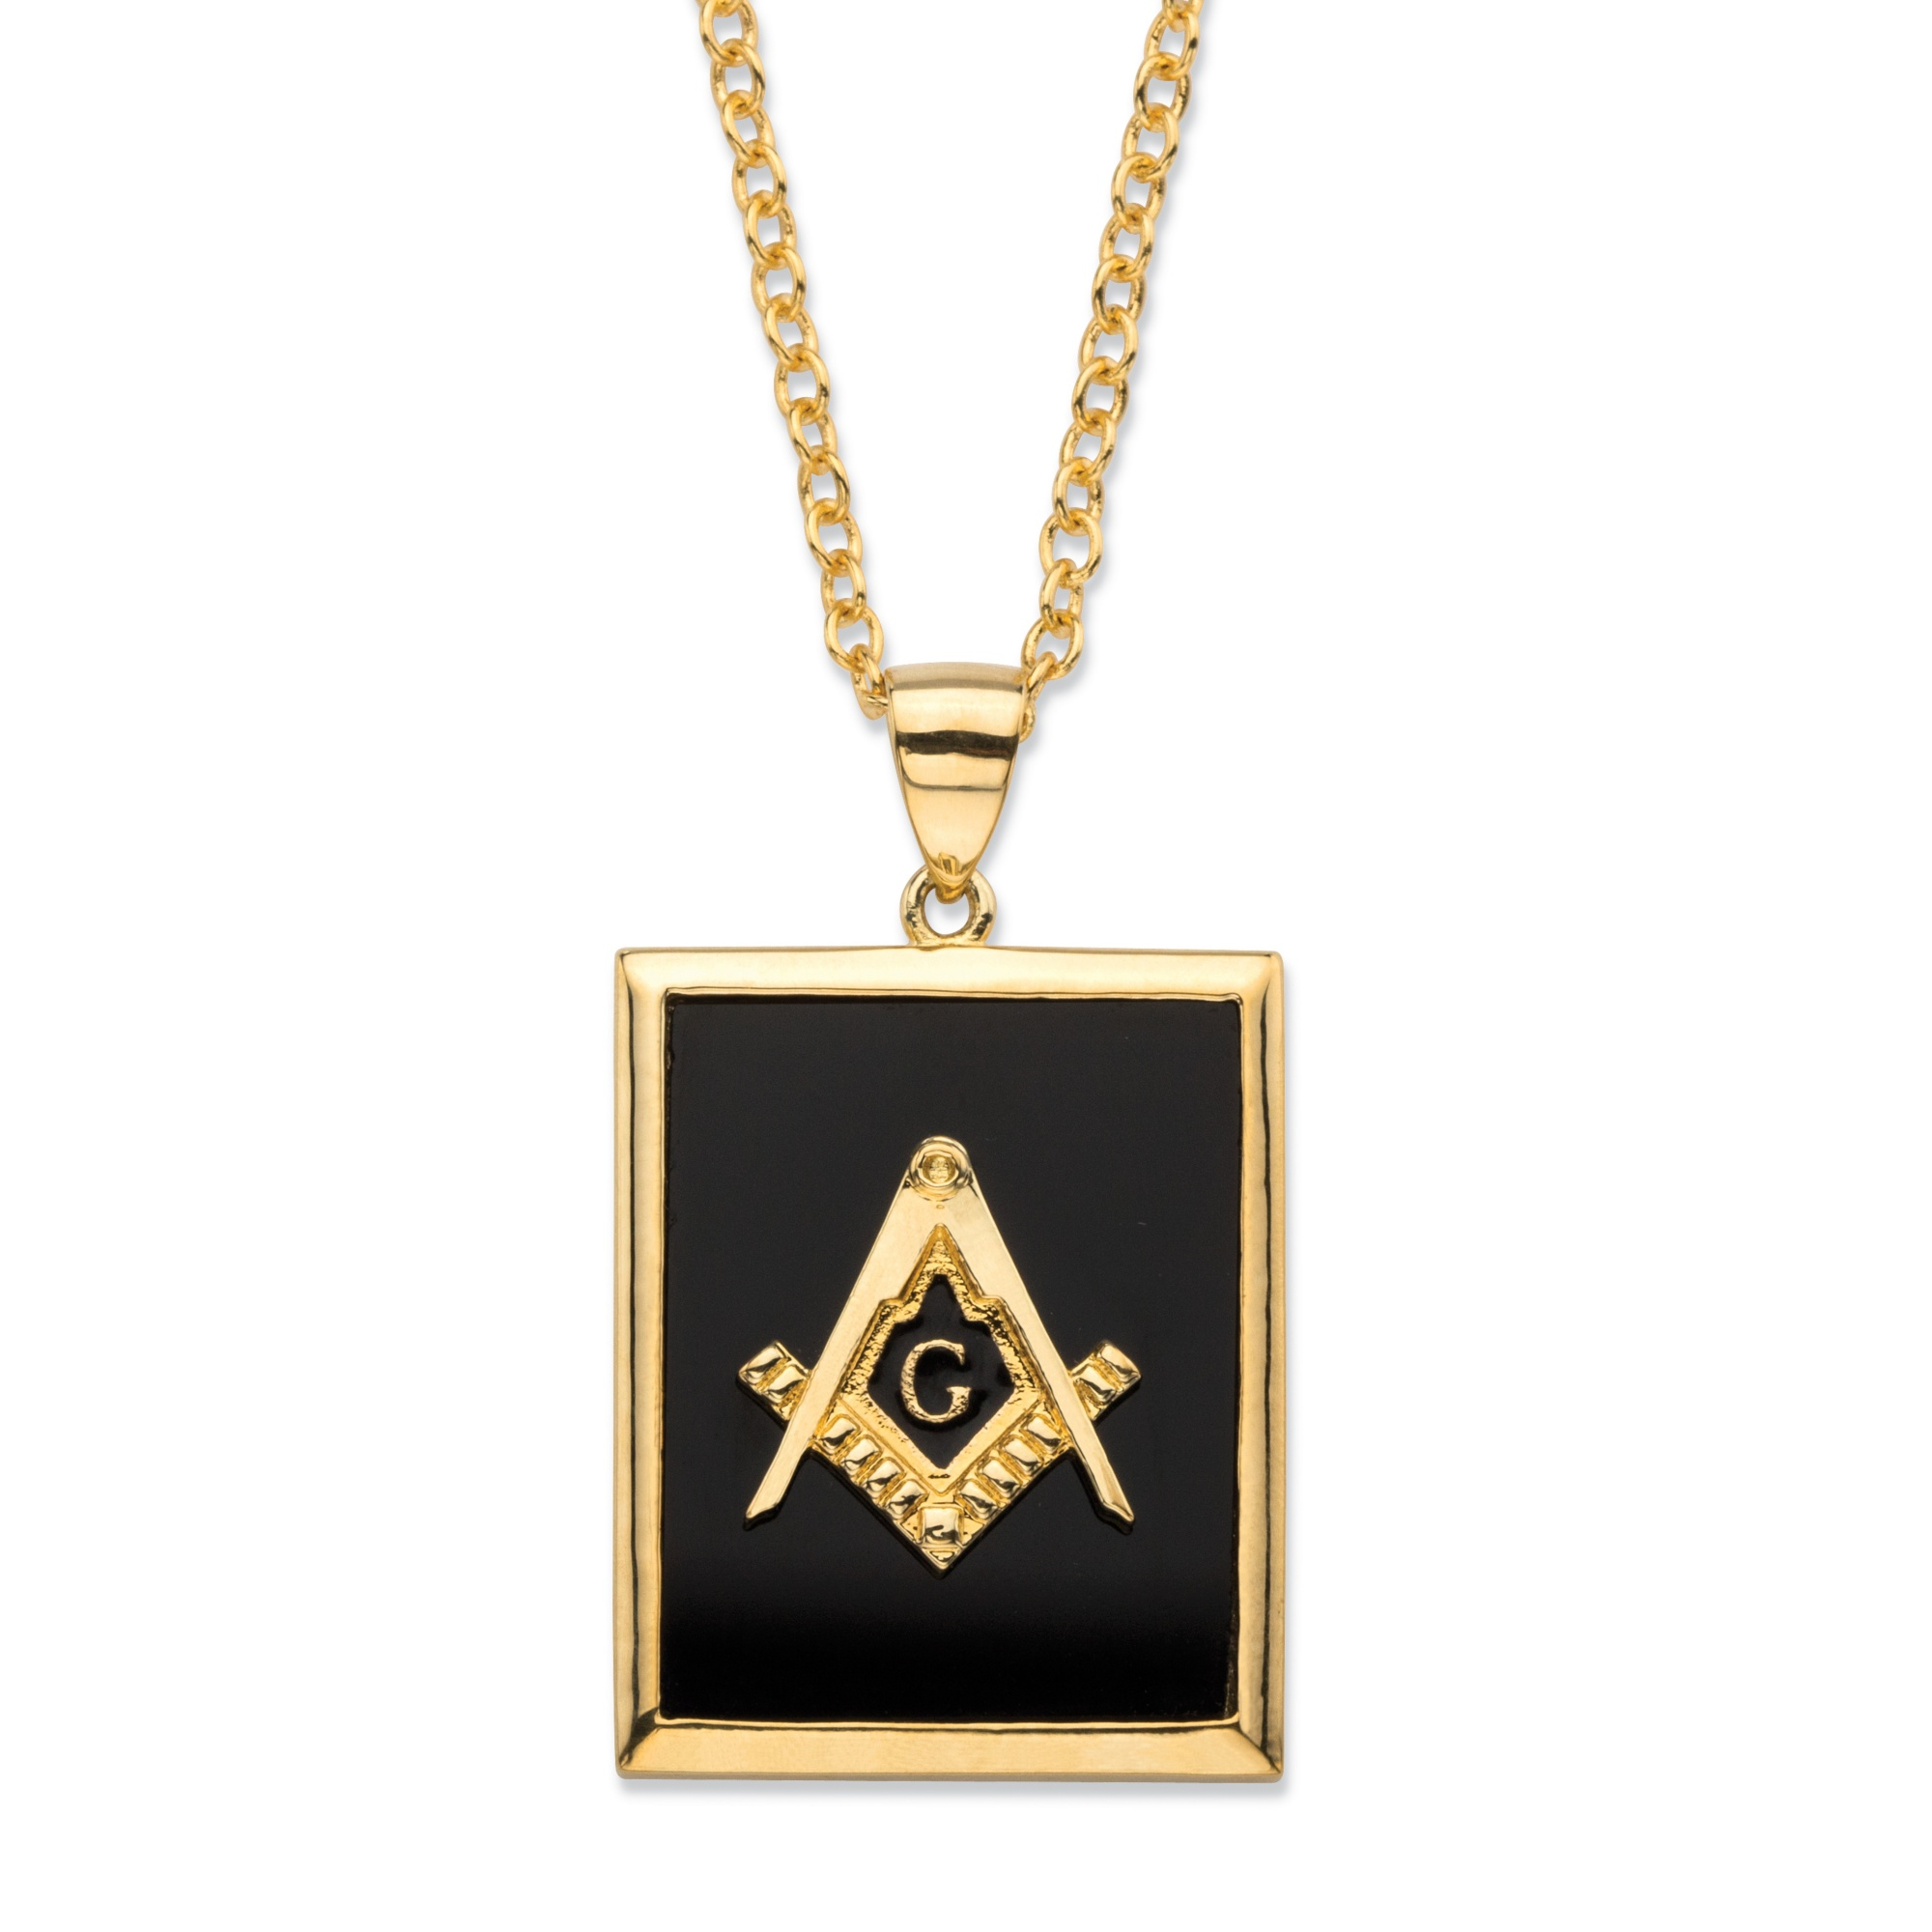 Men's Emerald-Cut Genuine Black Onyx 14k Gold-Plated ... | 2000 x 2000 jpeg 277kB